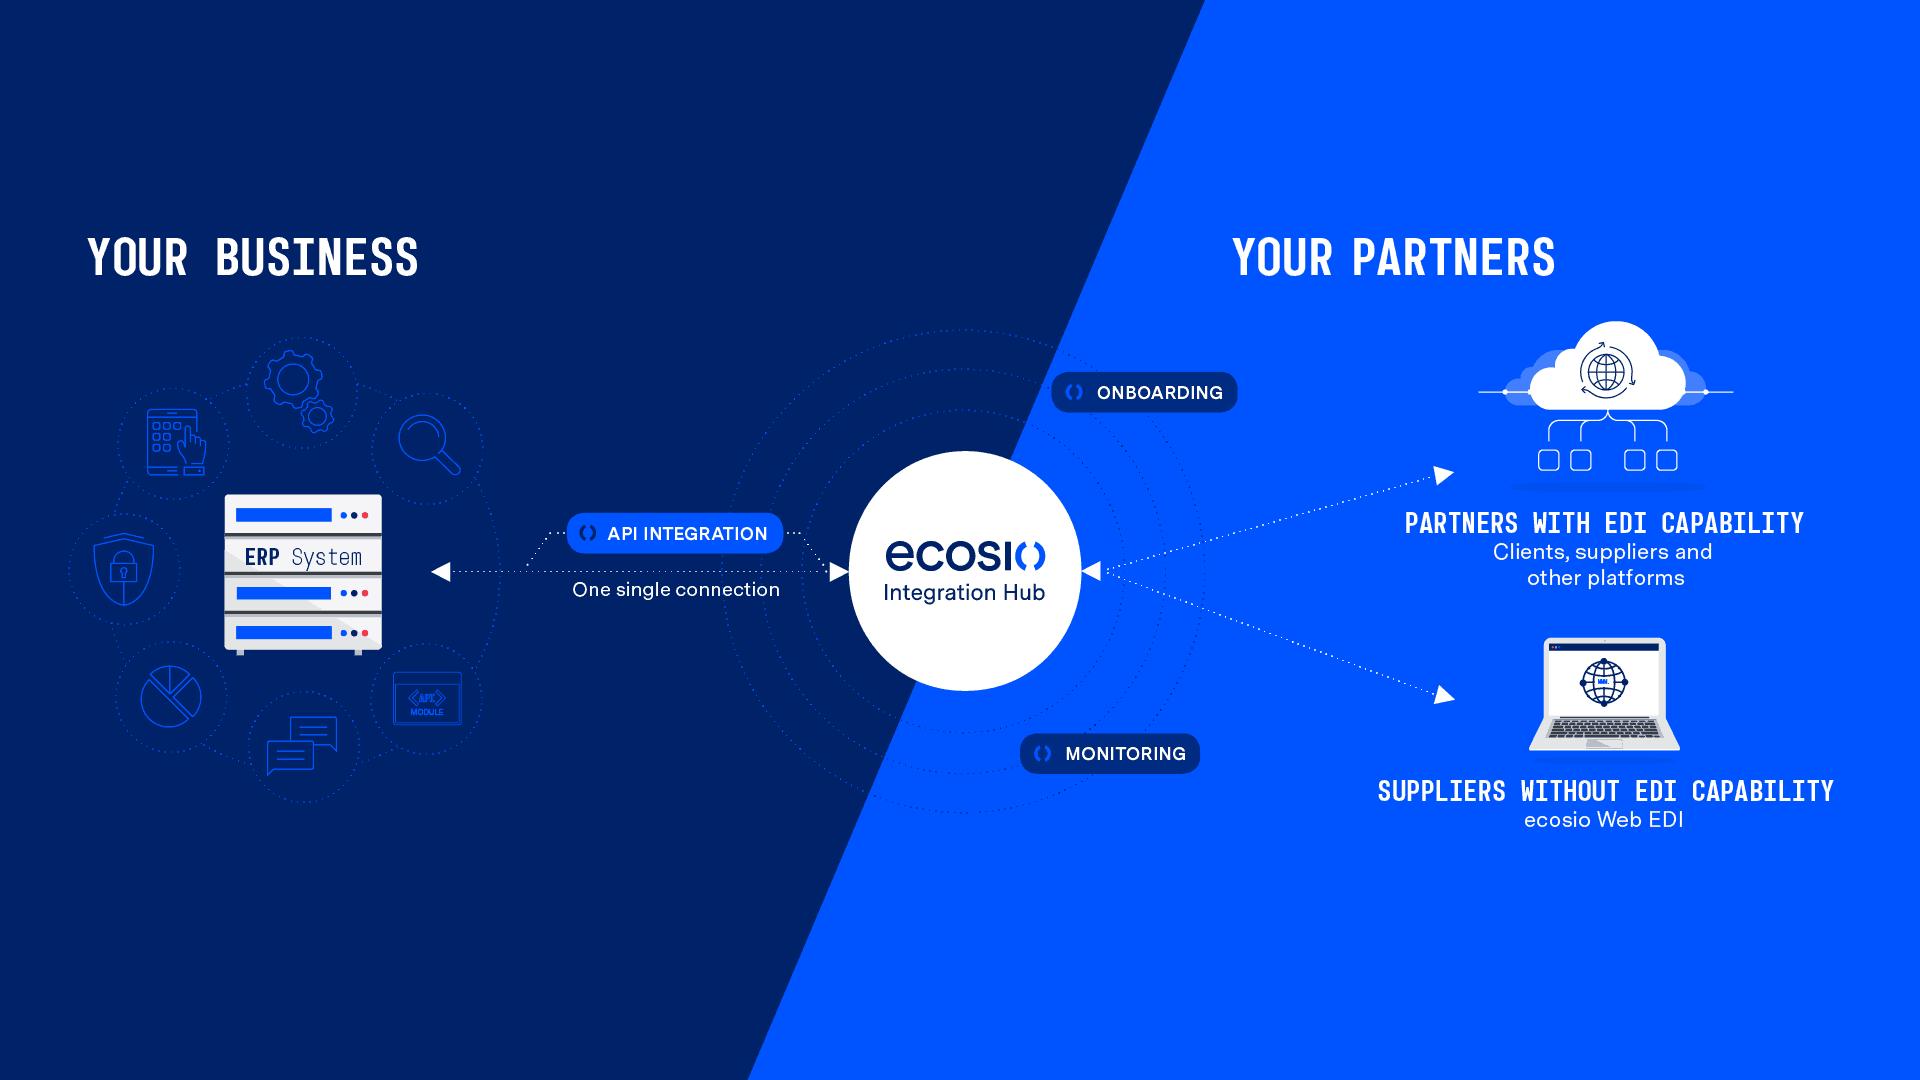 ecosio Integration Hub